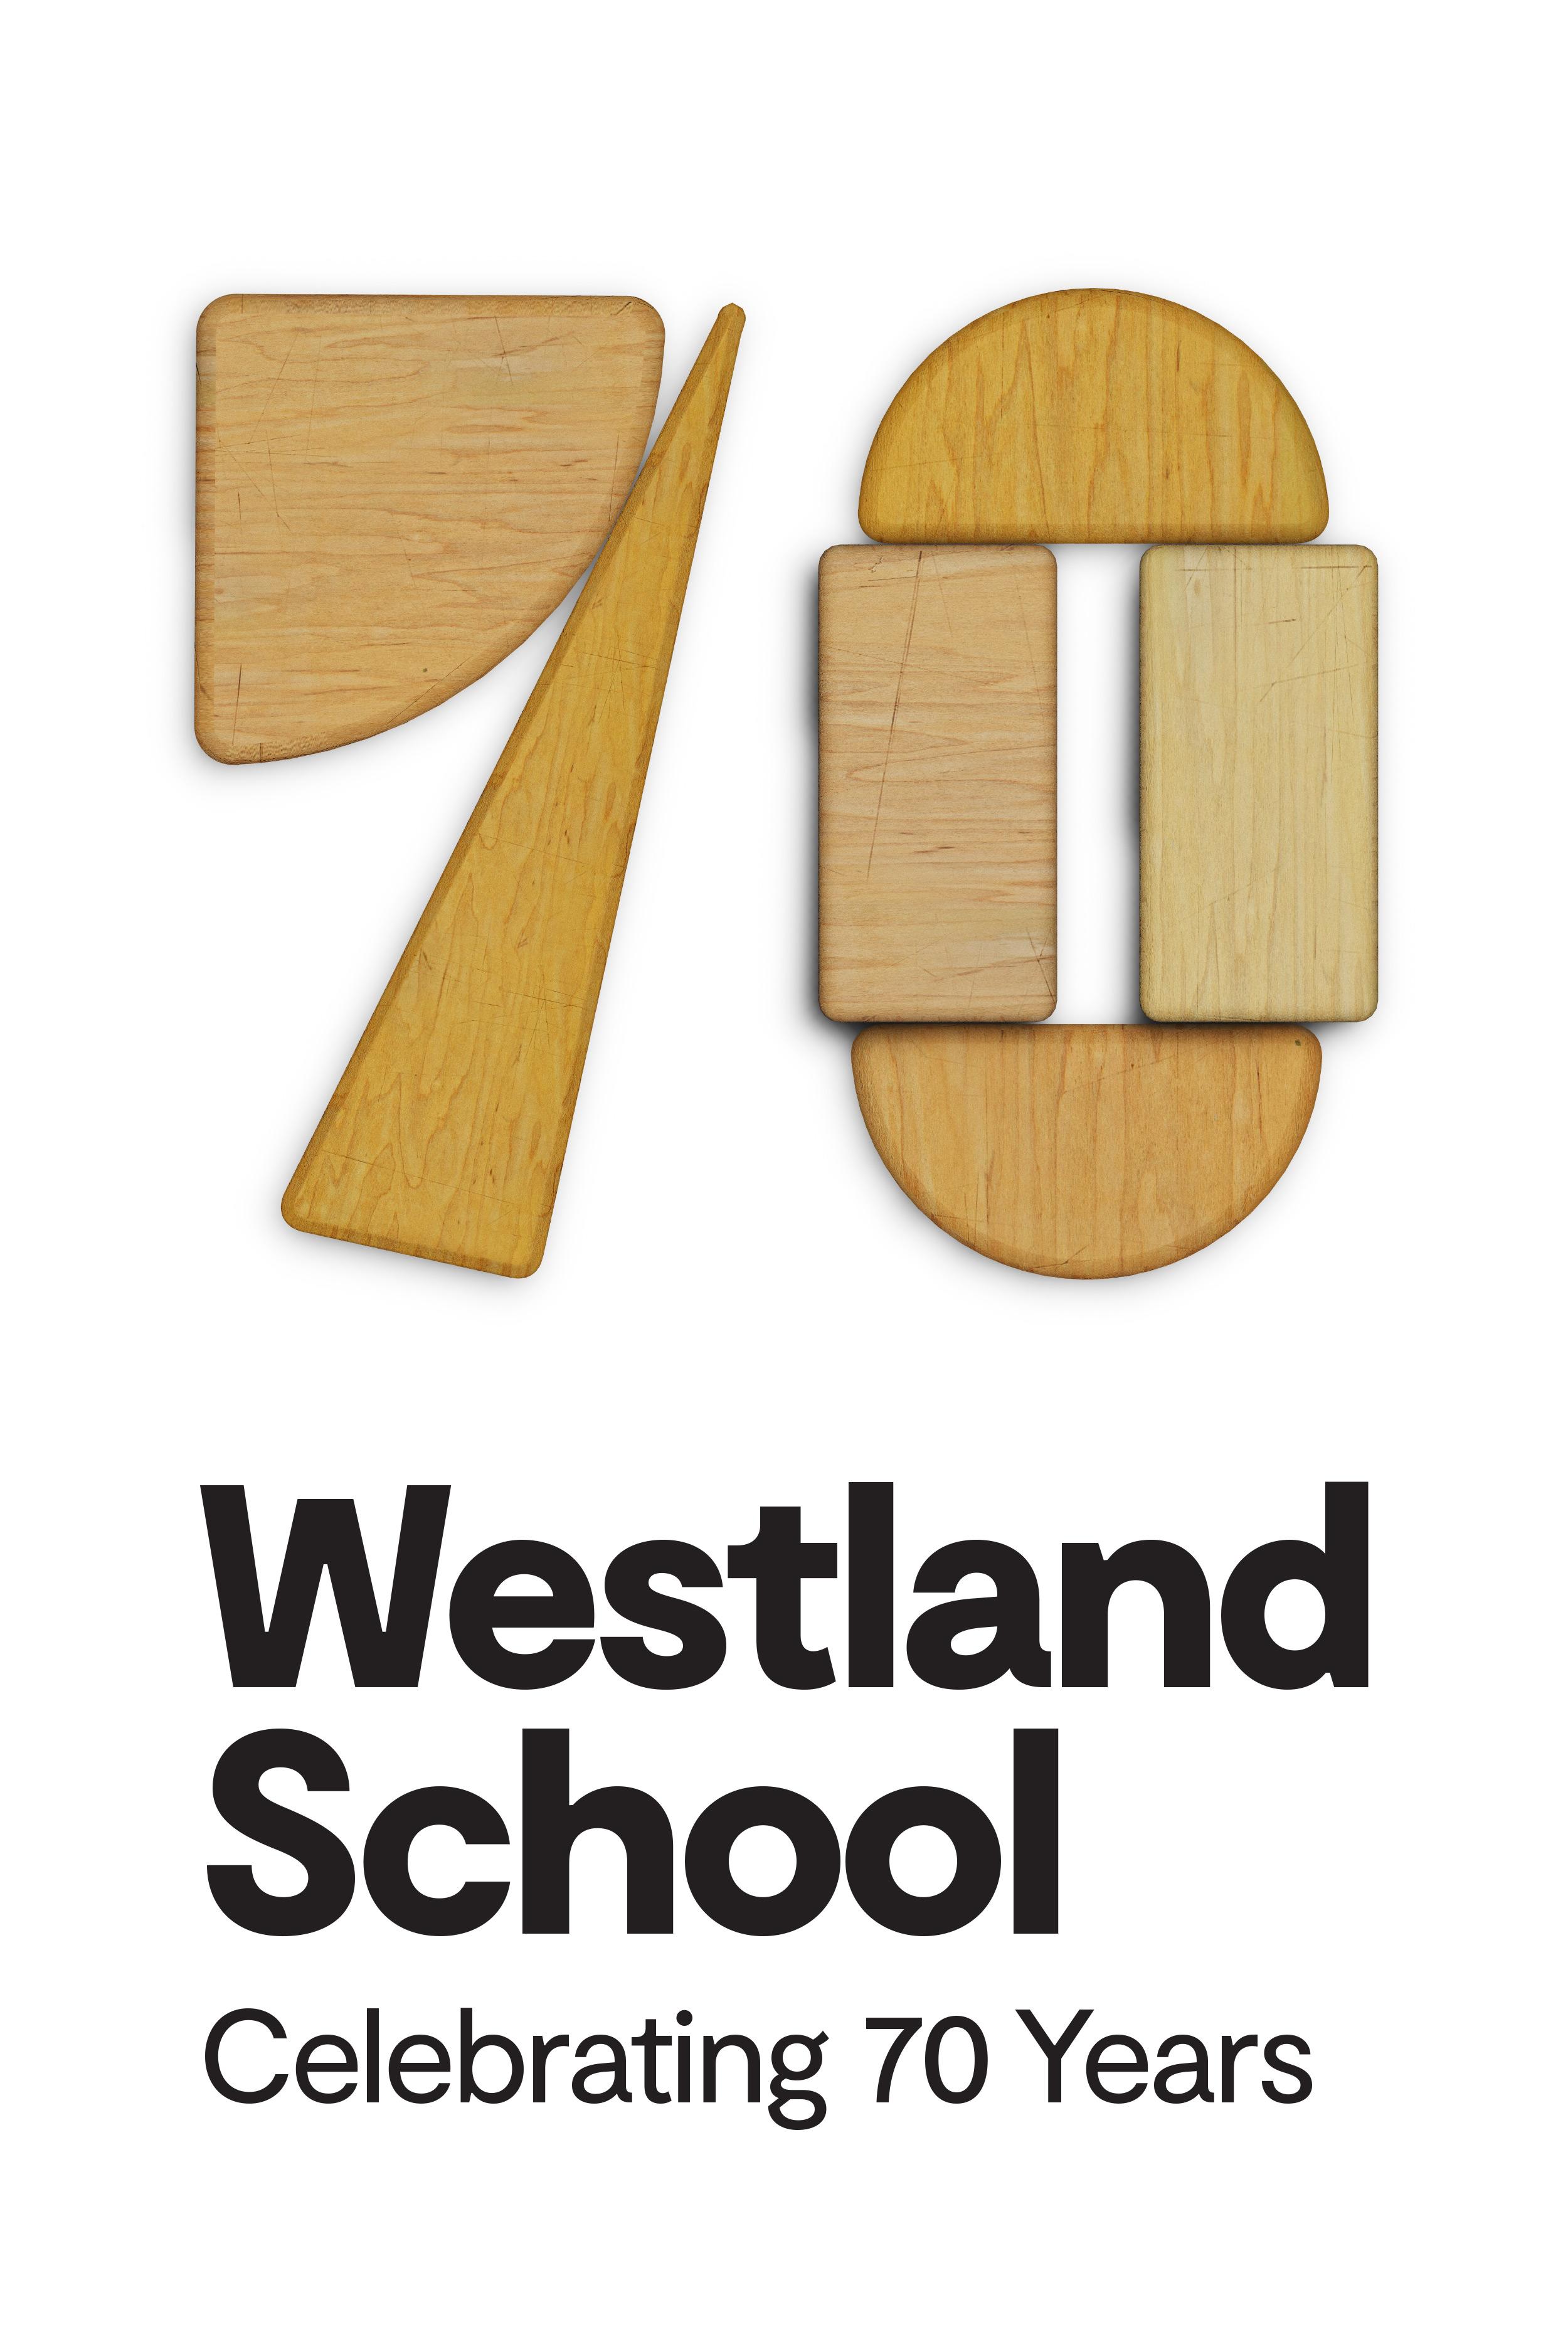 distinc_portfolio_westland_school_02.jpg